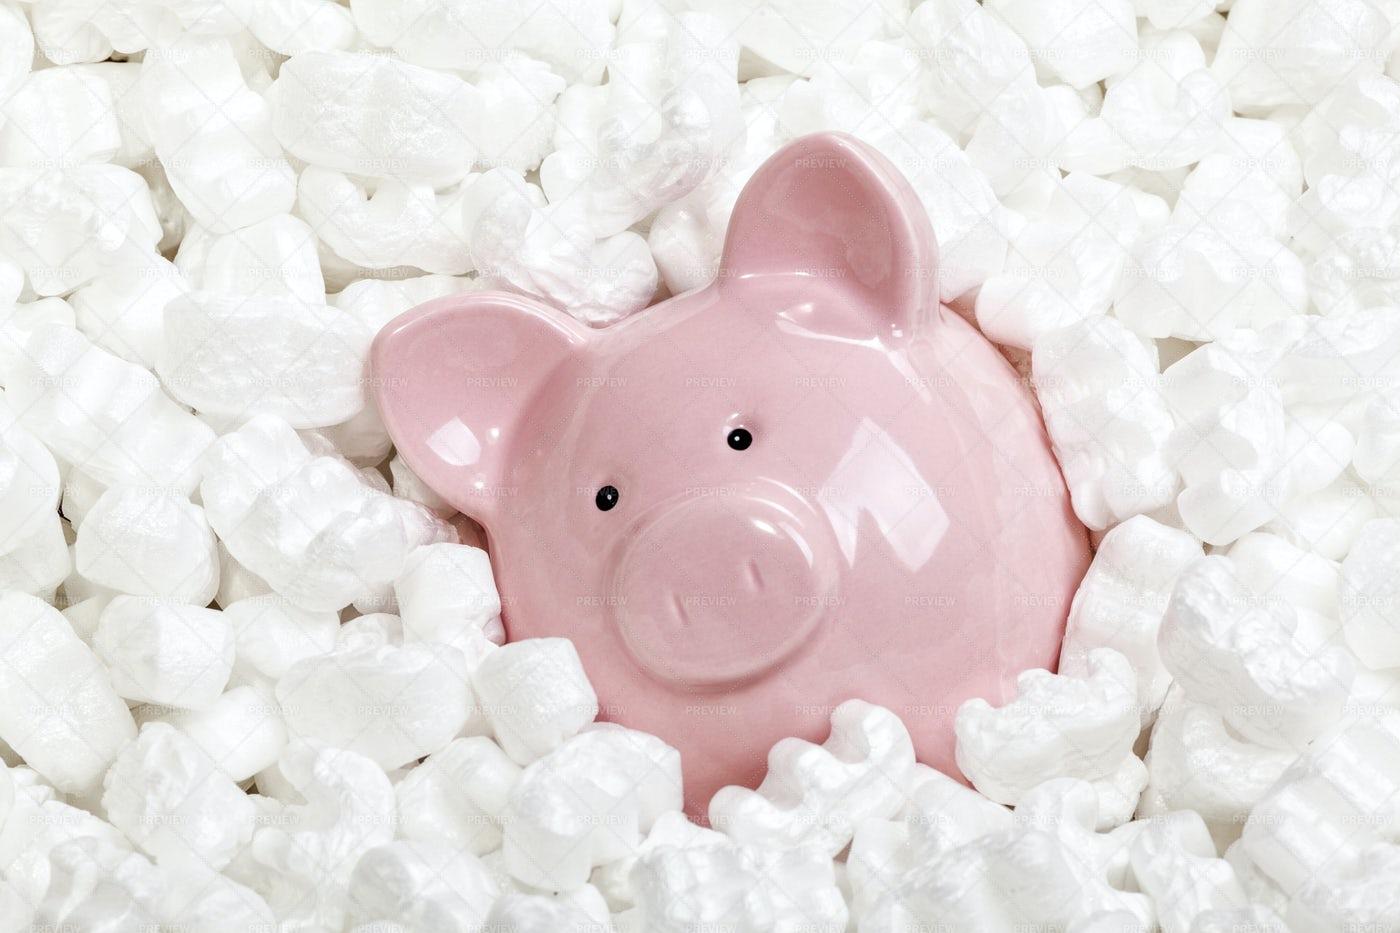 Save Your Money: Stock Photos